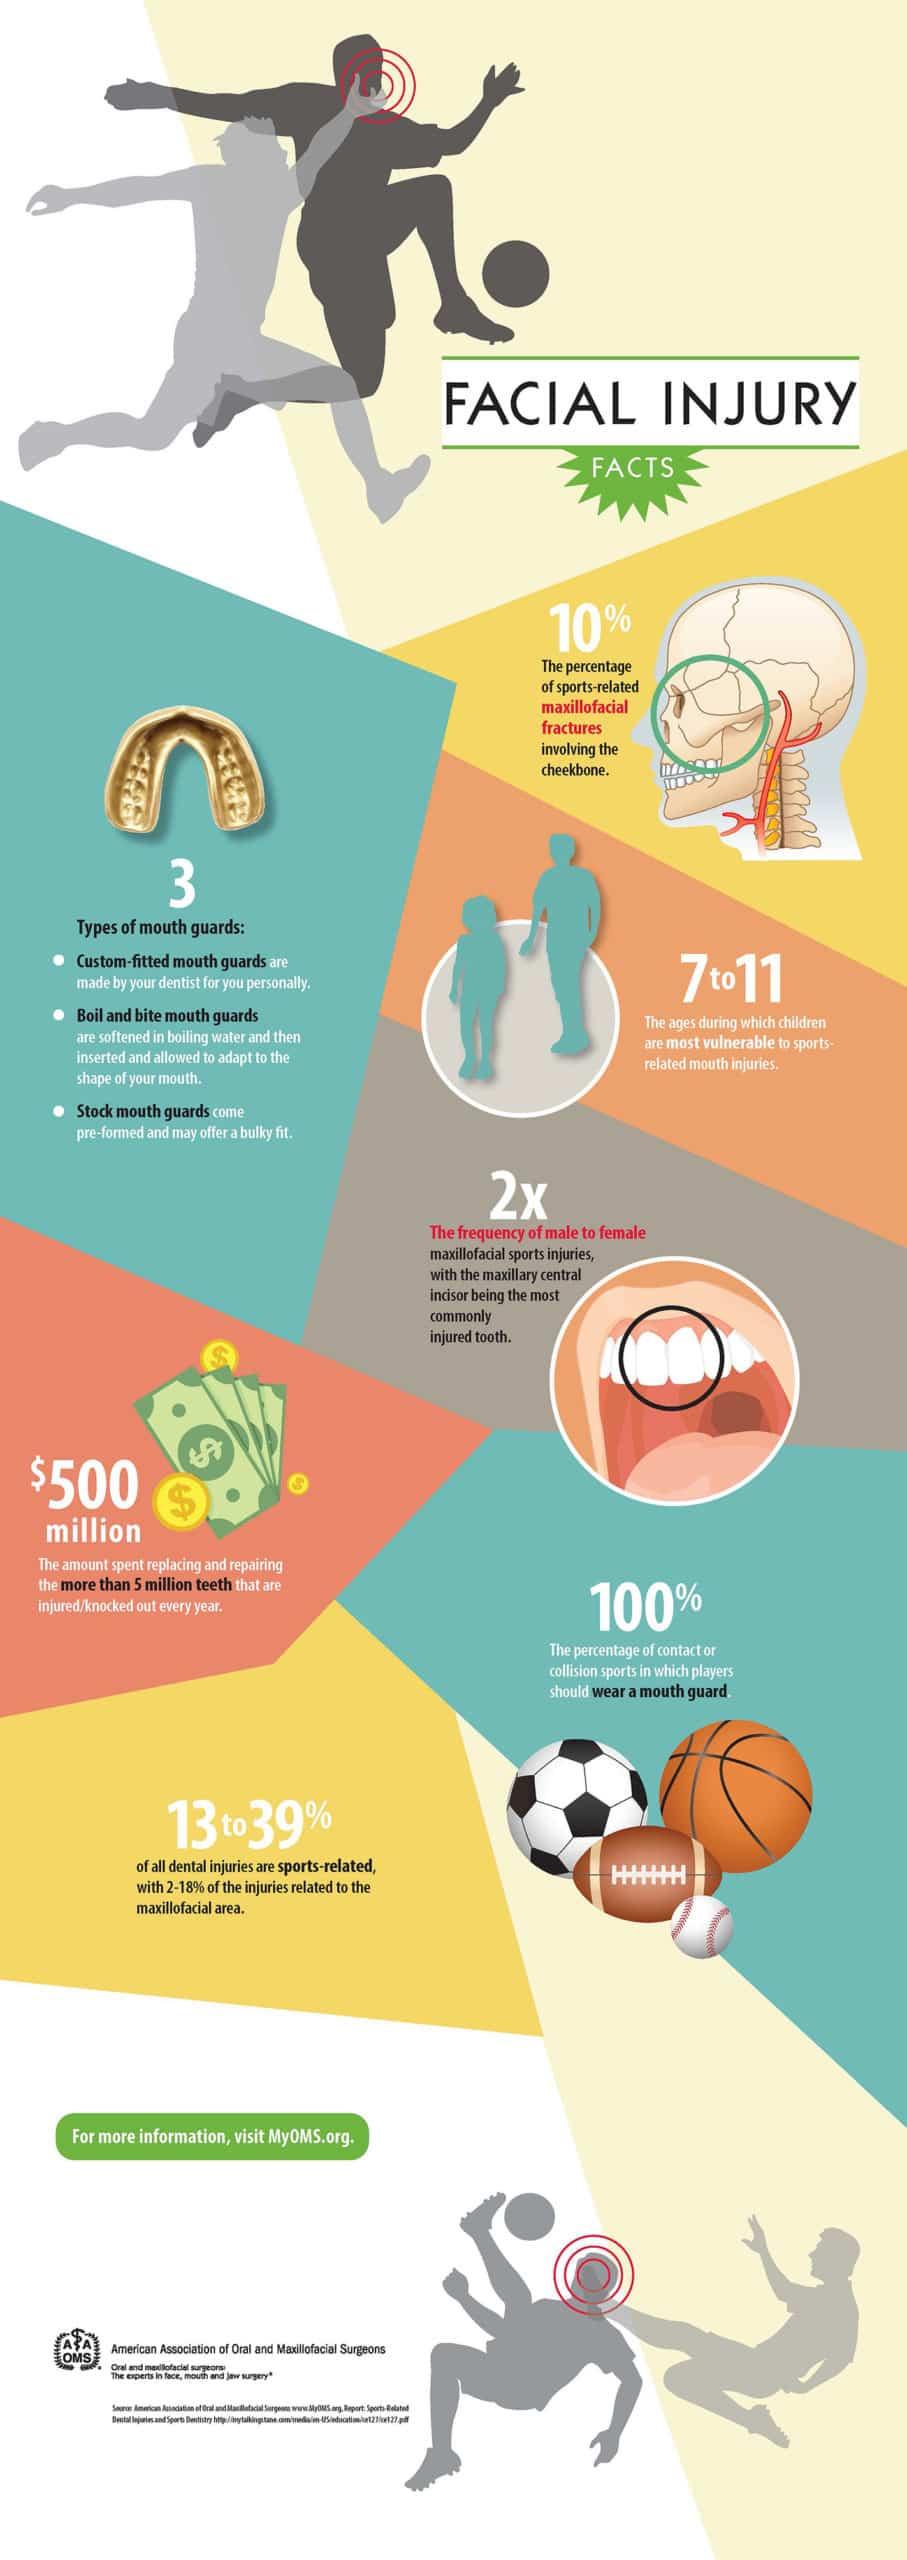 facial injury infographic